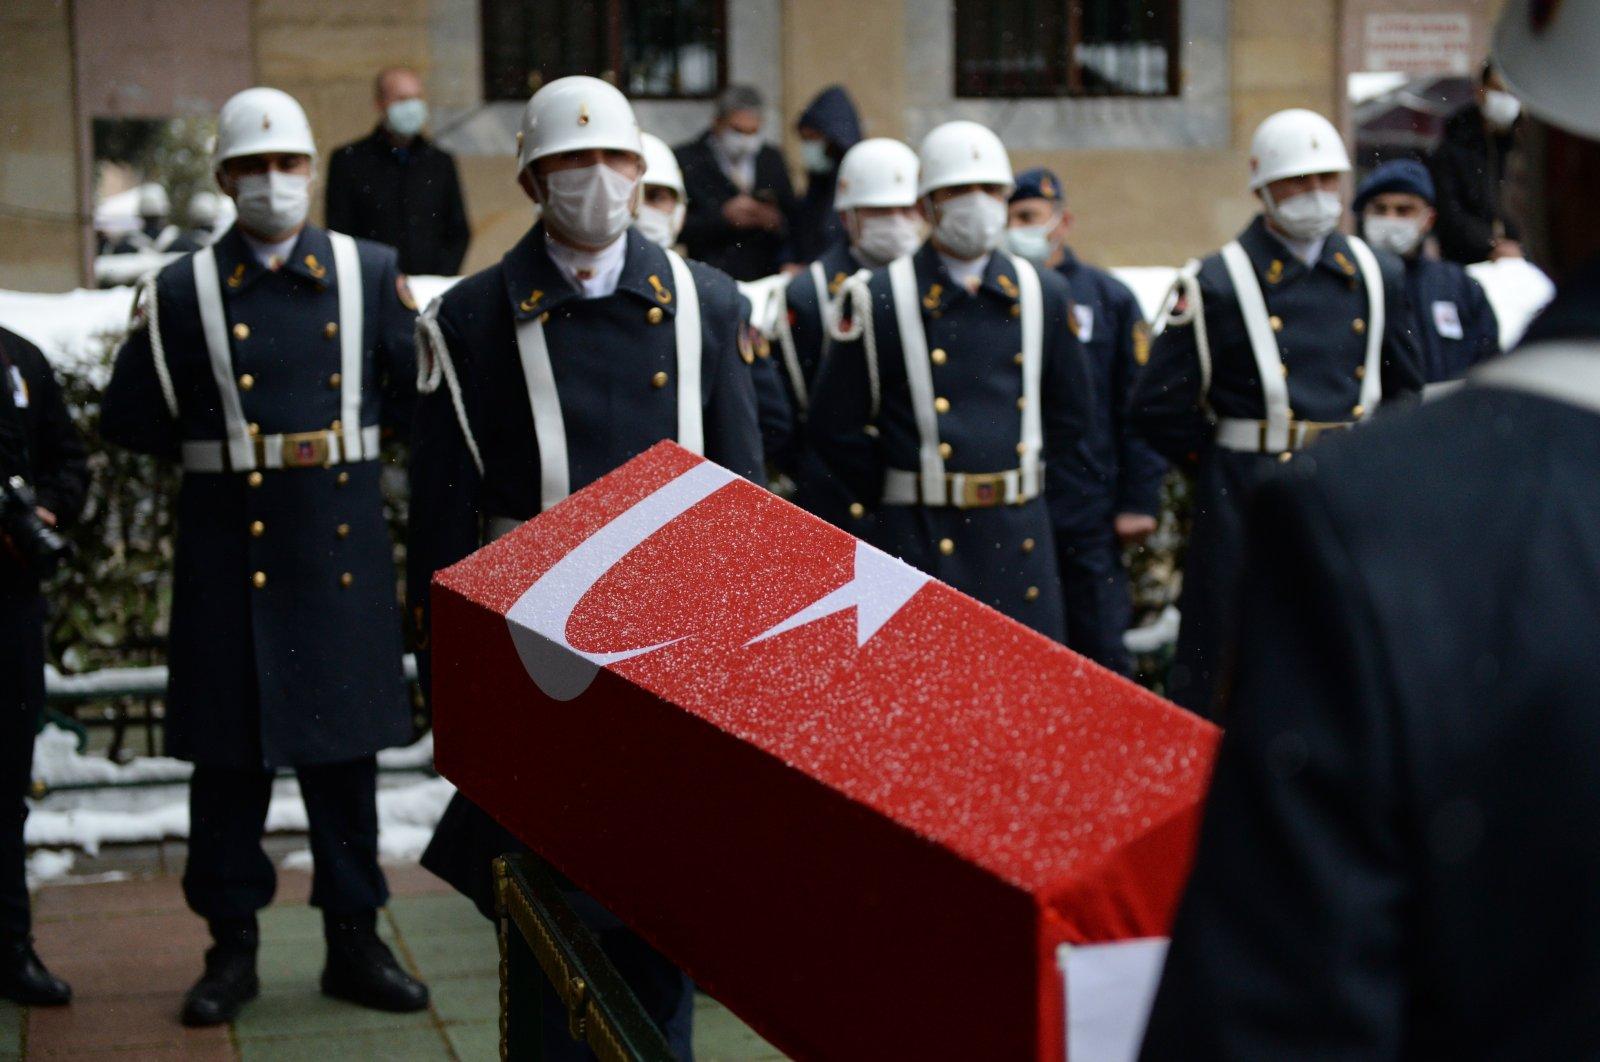 A funeral ceremony is held for GendarmerieSpecialist Sgt. Mevlüt Kahveci who was executed by the PKK terrorist group in northern Iraq's Gara region, in Eskişehir province,Turkey, Feb. 15, 2021. (AA Photo)